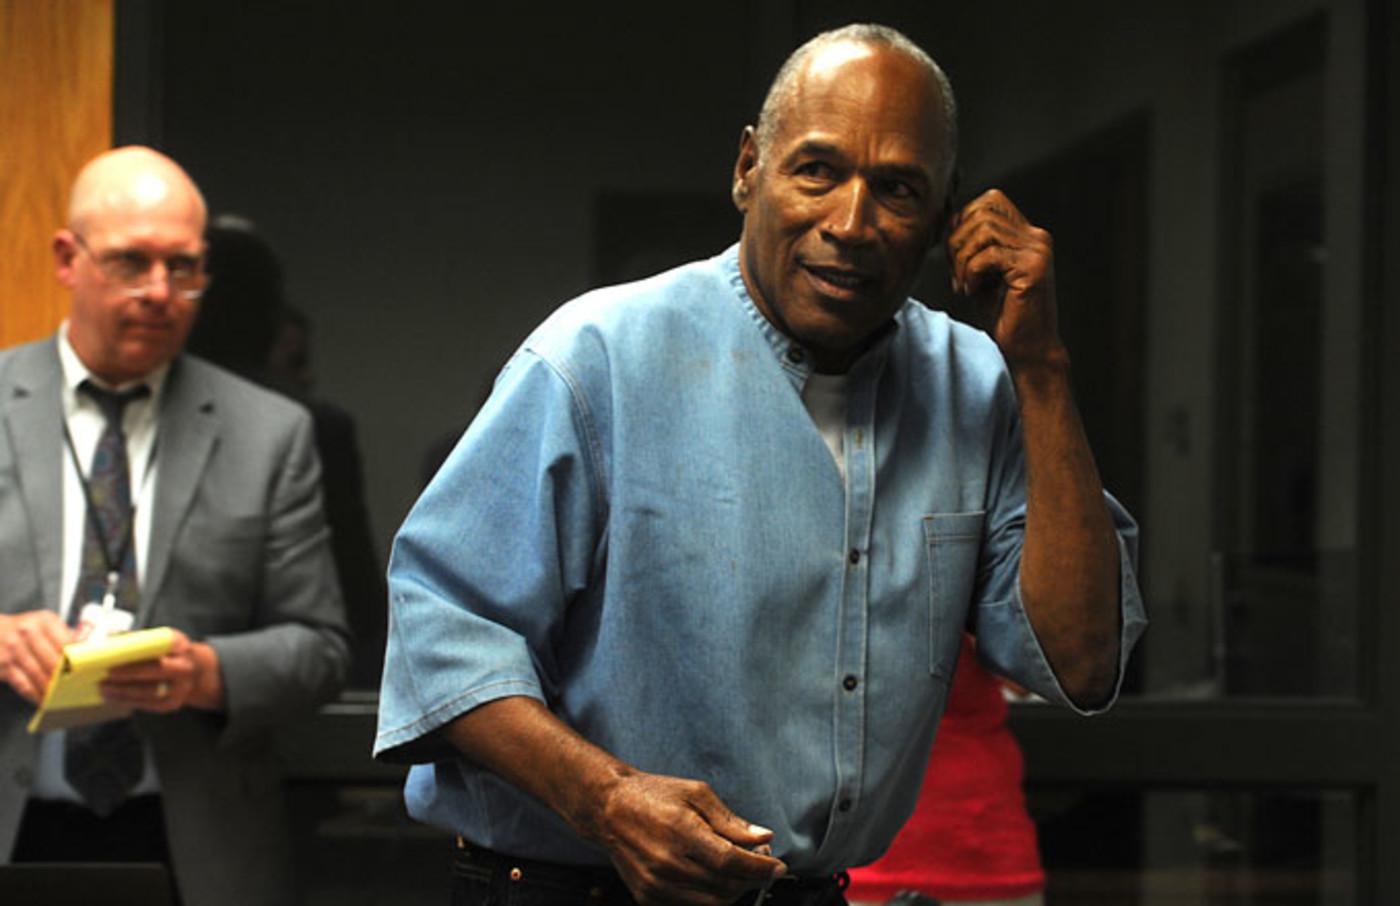 O.J. Simpson during his parole hearing.